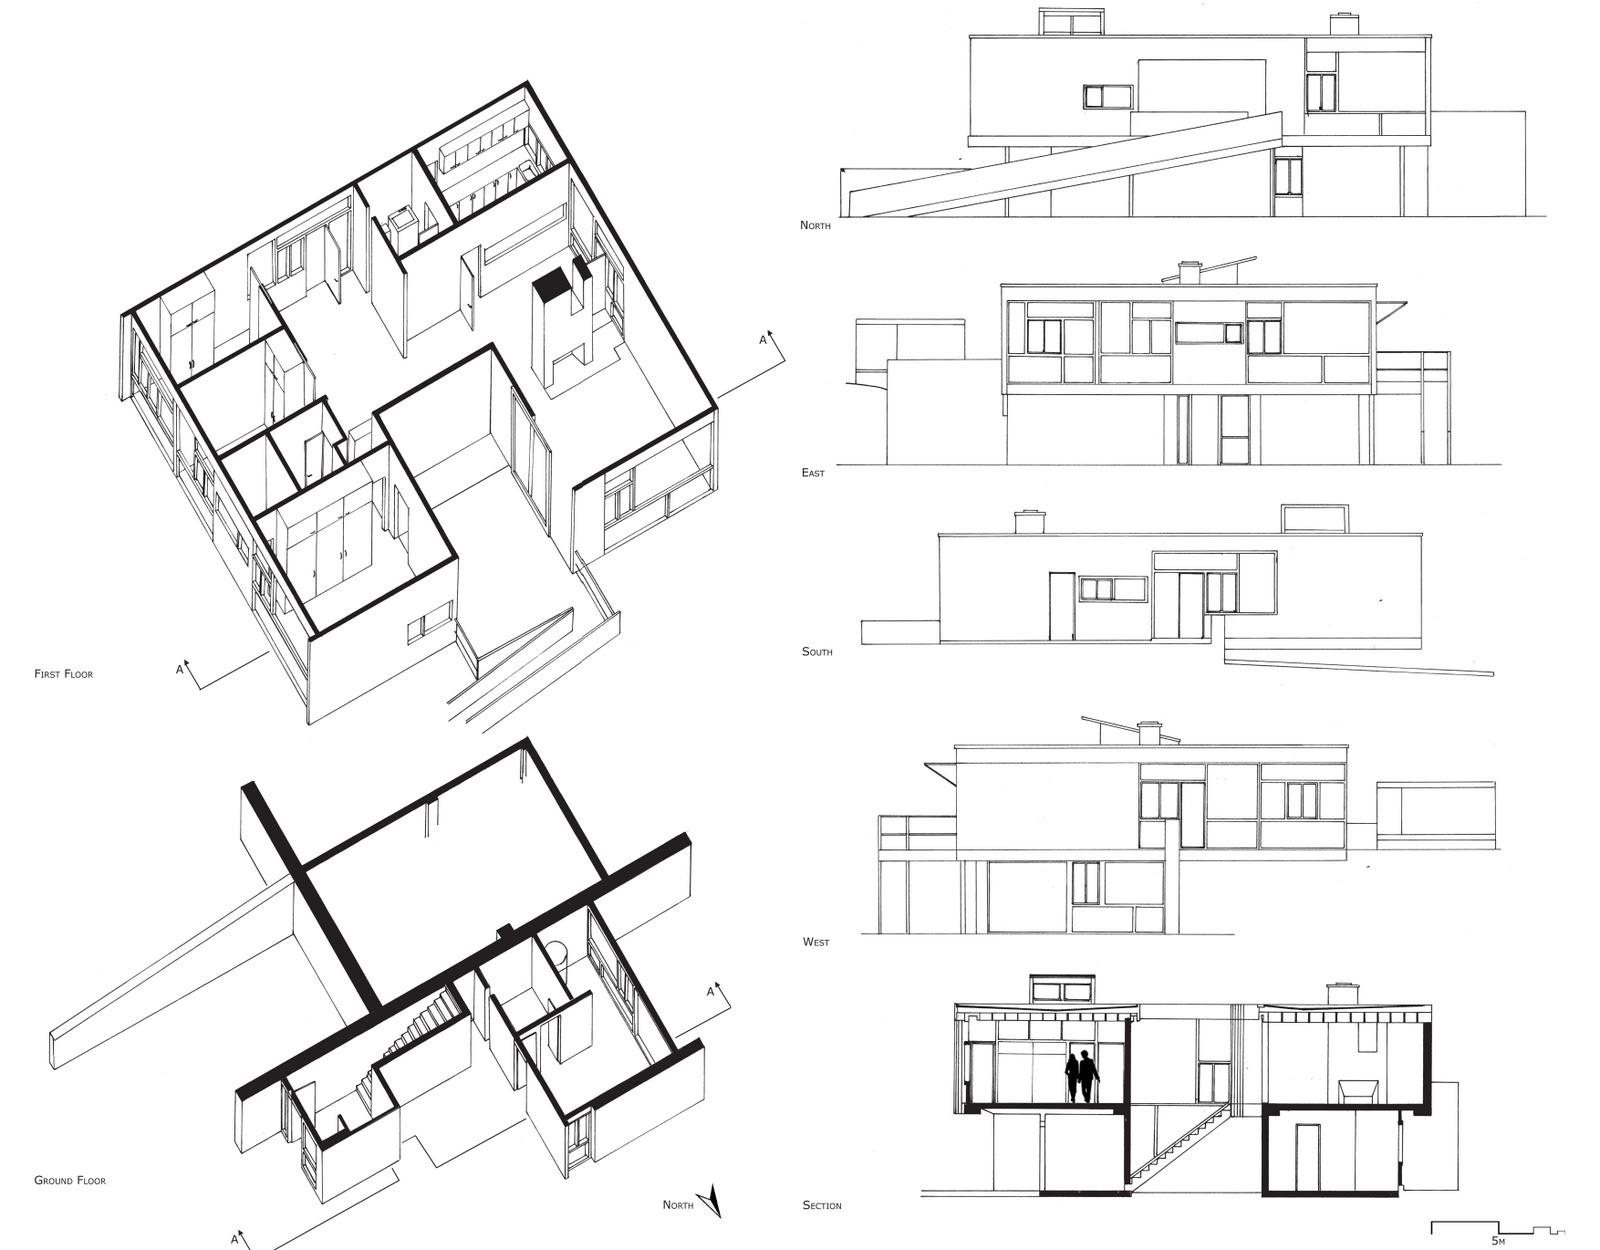 Up House Drawing At Getdrawings